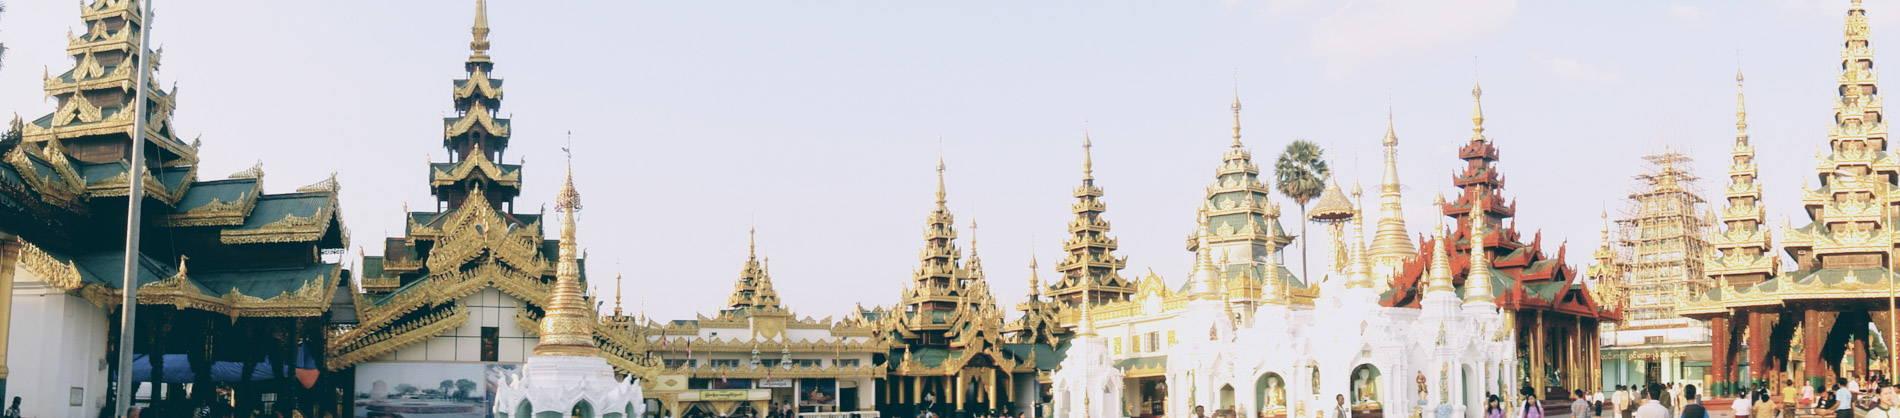 Yangon Shwe Dagon Pagoda